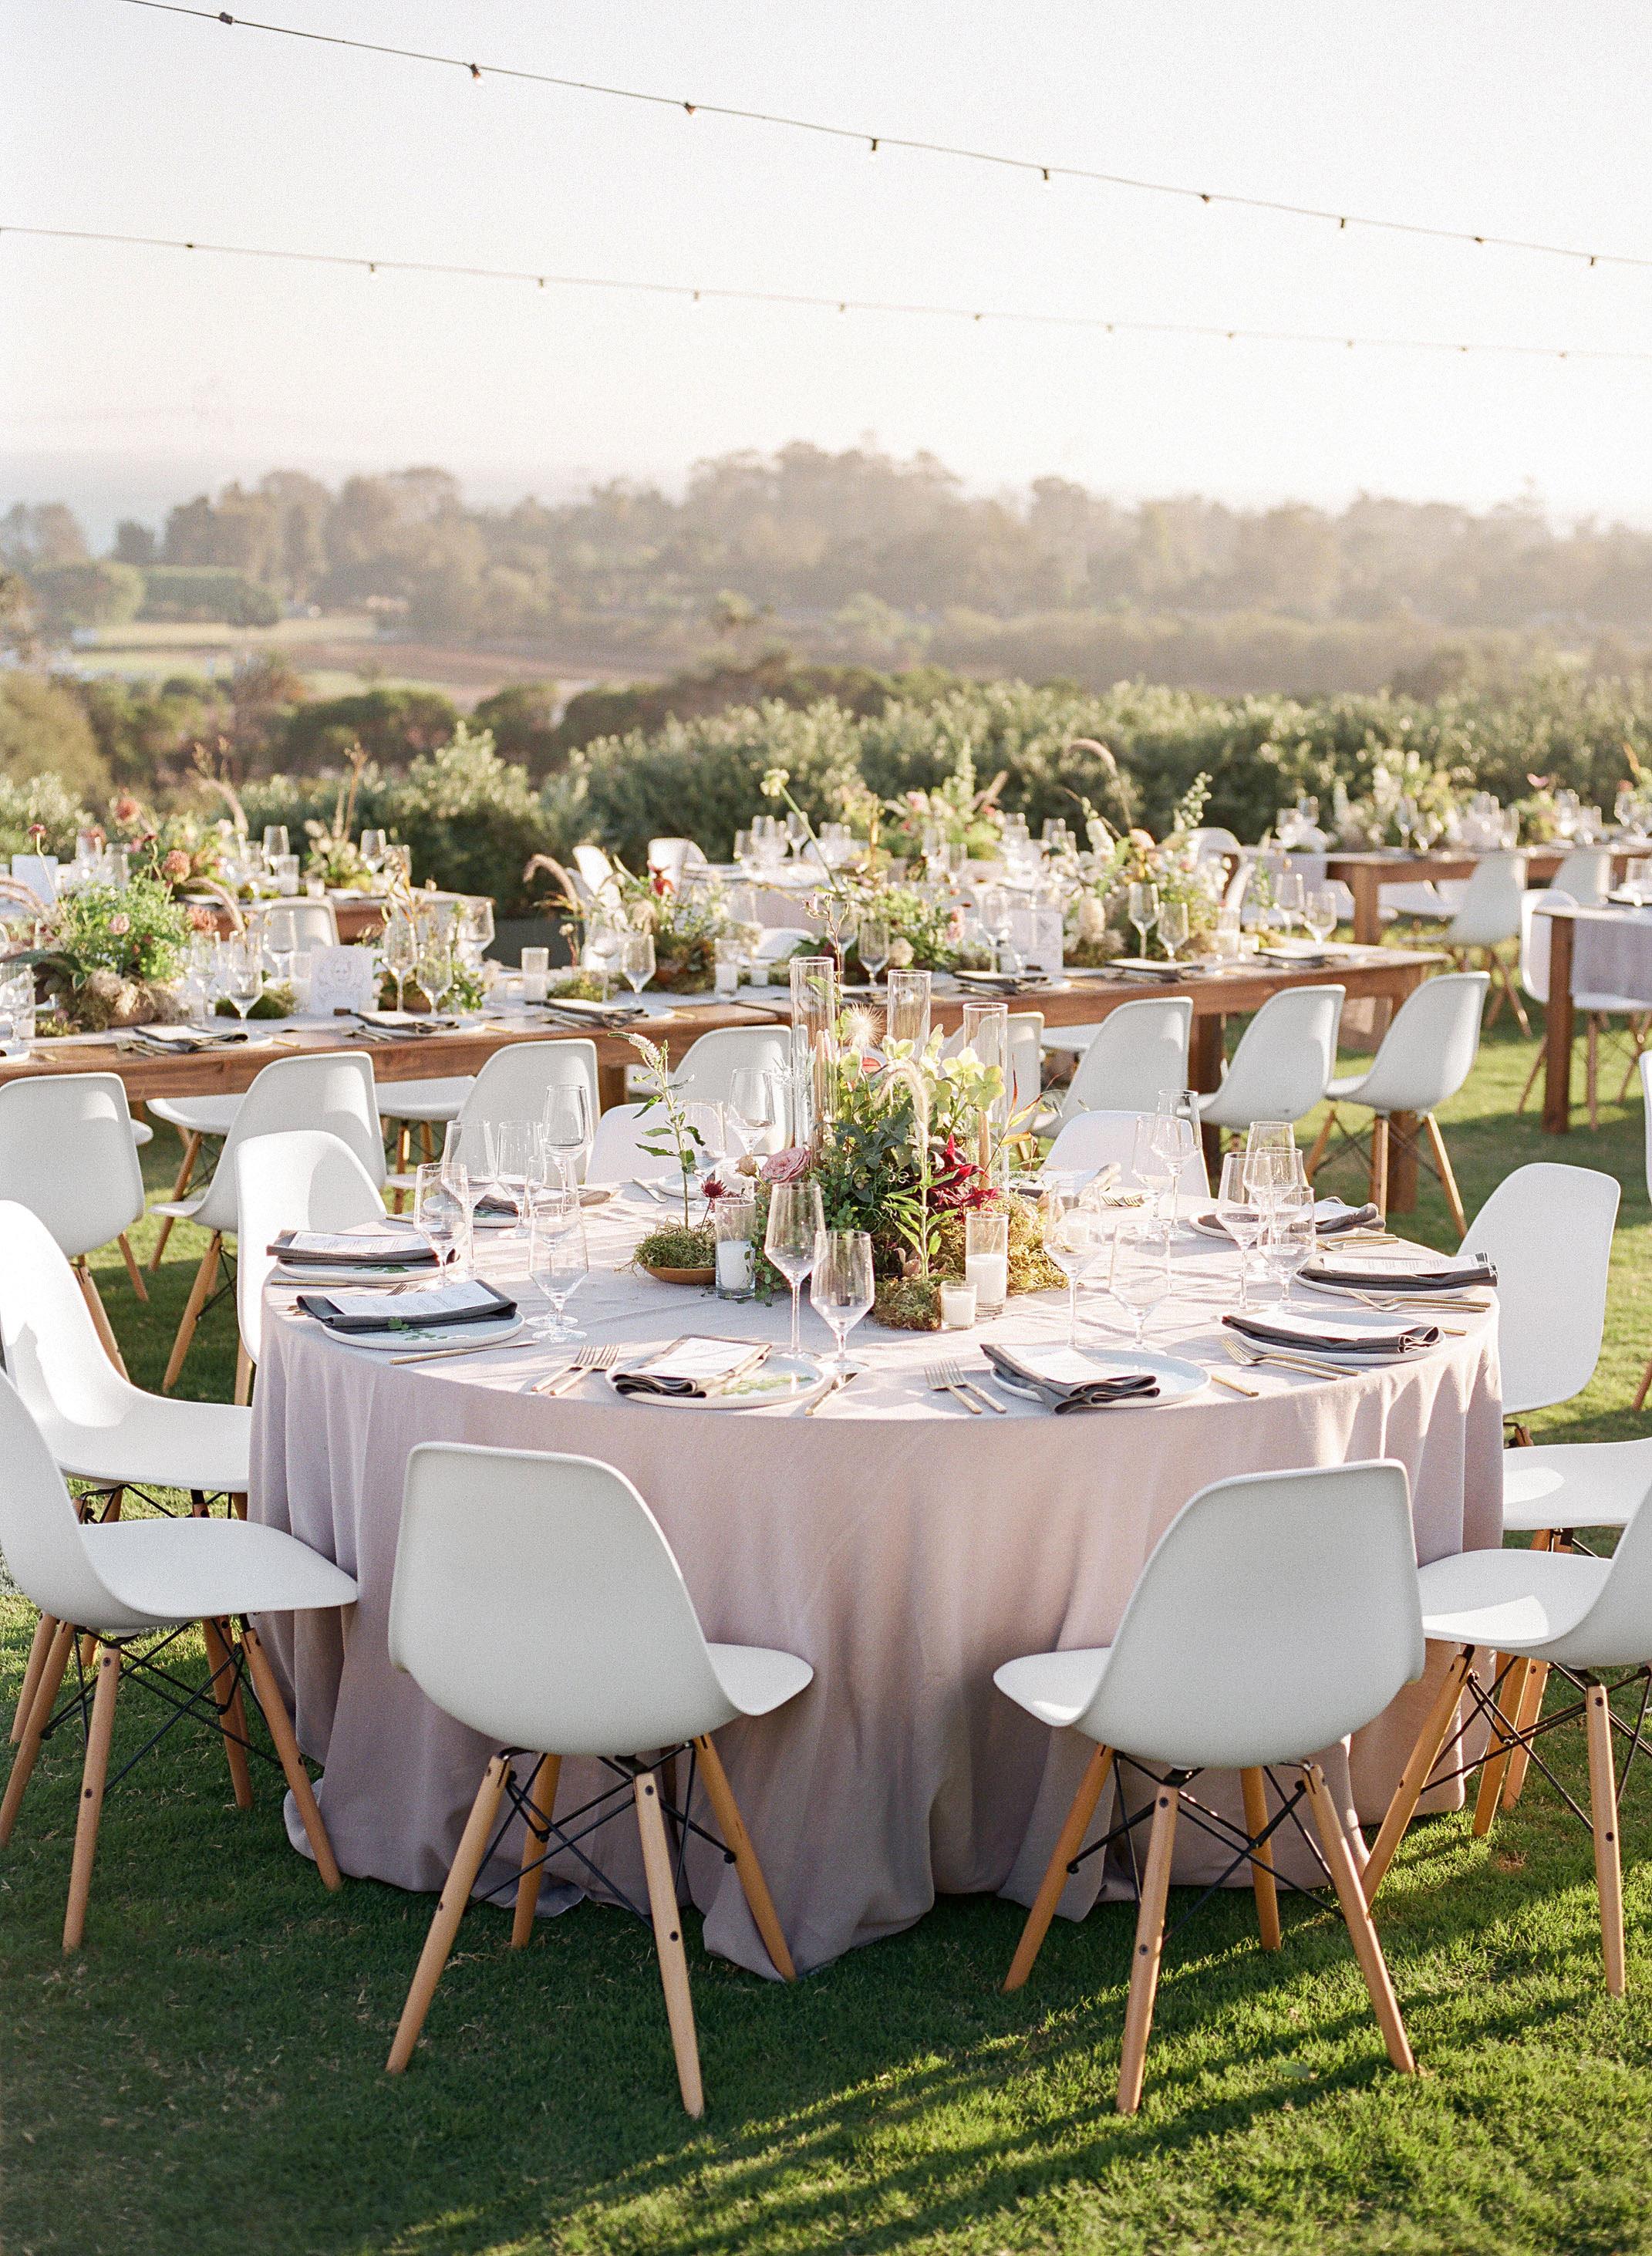 natasha nick wedding california tables